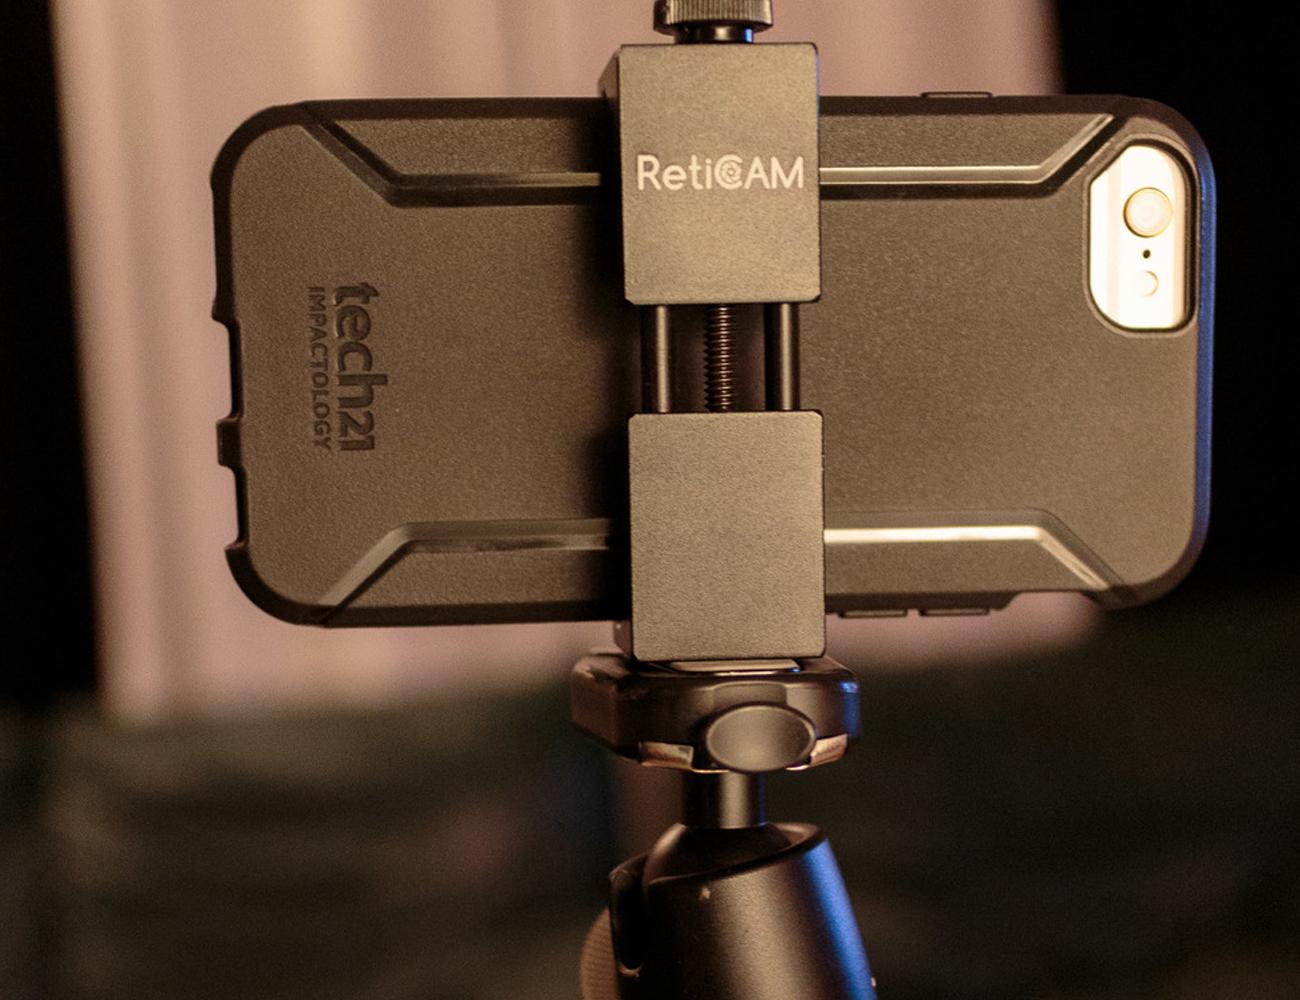 RetiCAM Smartphone Tripod Mount